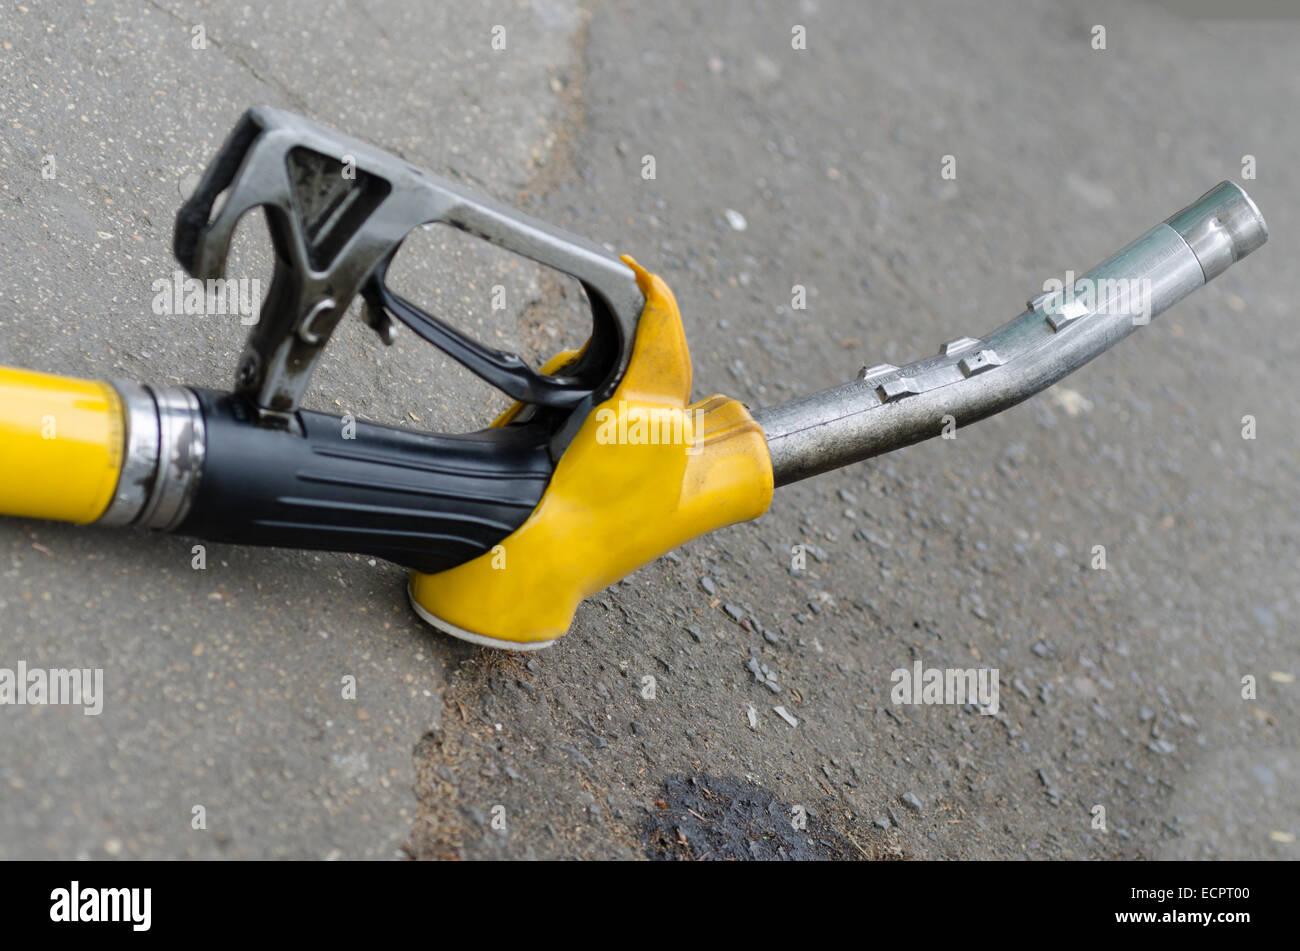 Yellow gas nozzle on the sidewalk - Stock Image